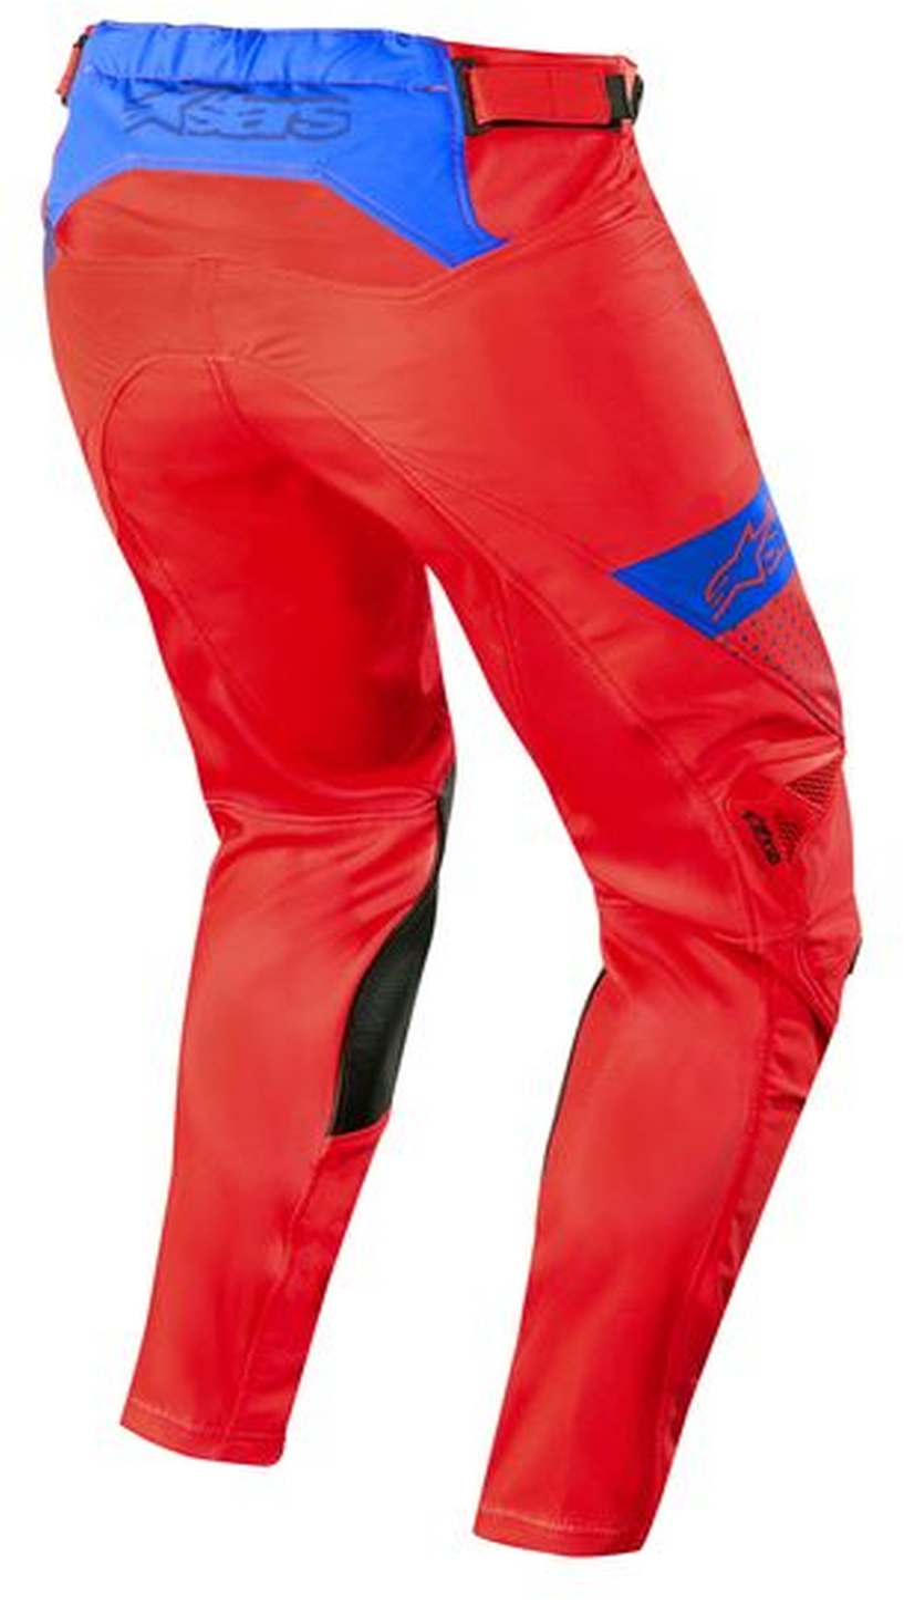 RACER TECH ATOMIC PANTS